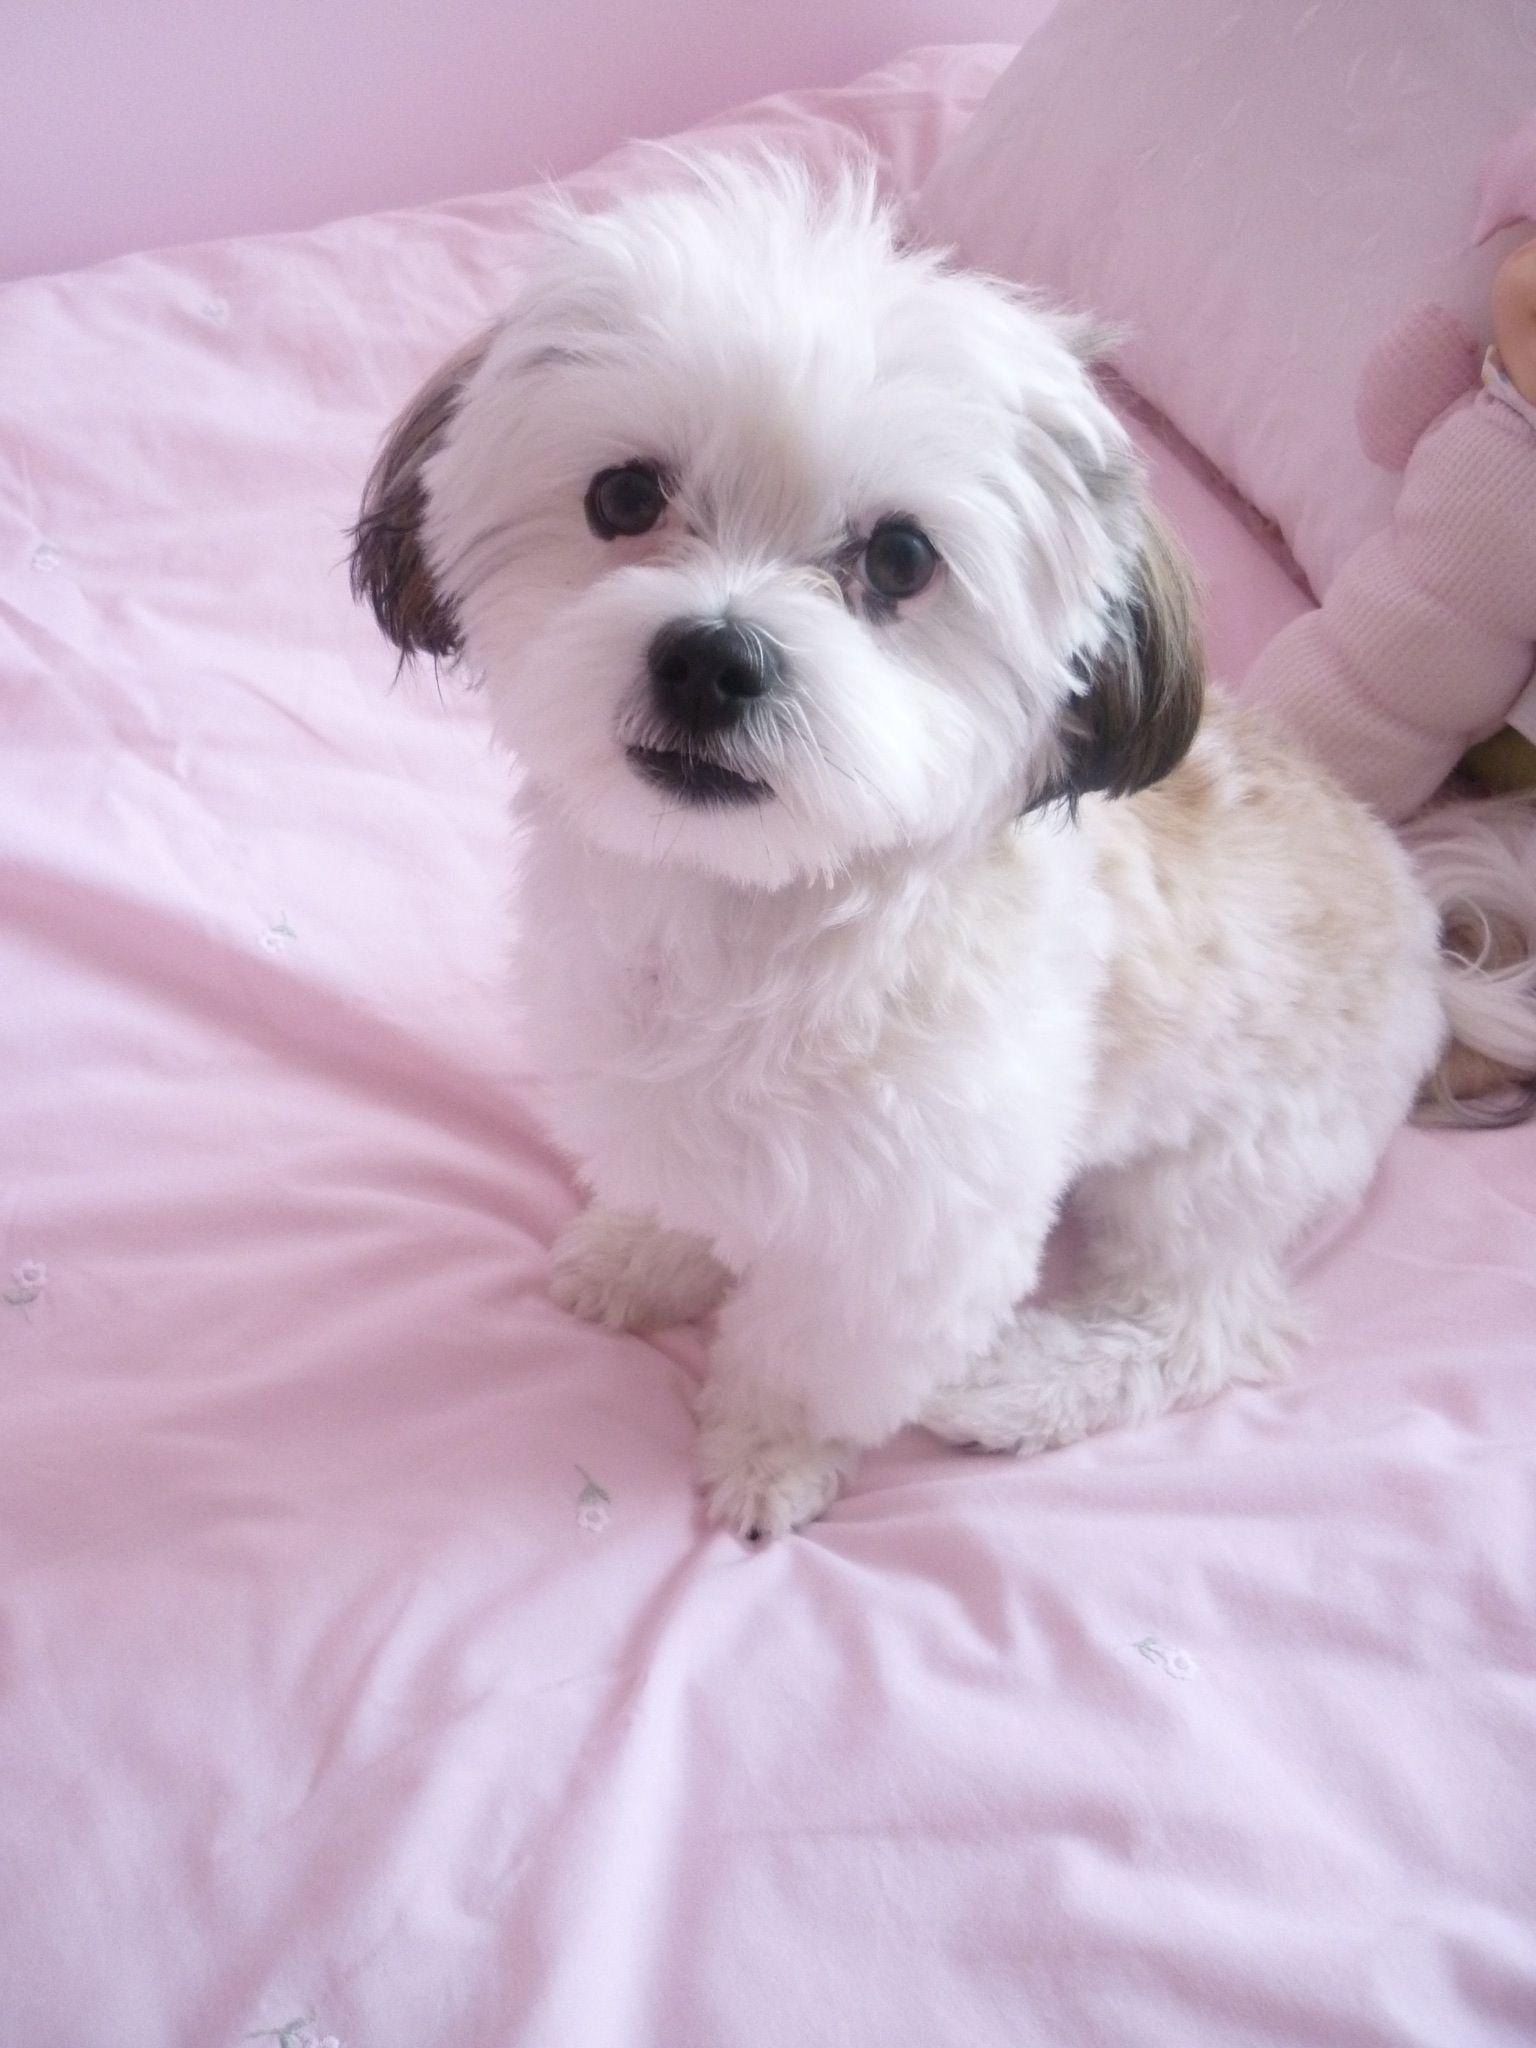 My Cute Maltese Shih Tzu Cute Dogs Dog Breeds Lap Dogs